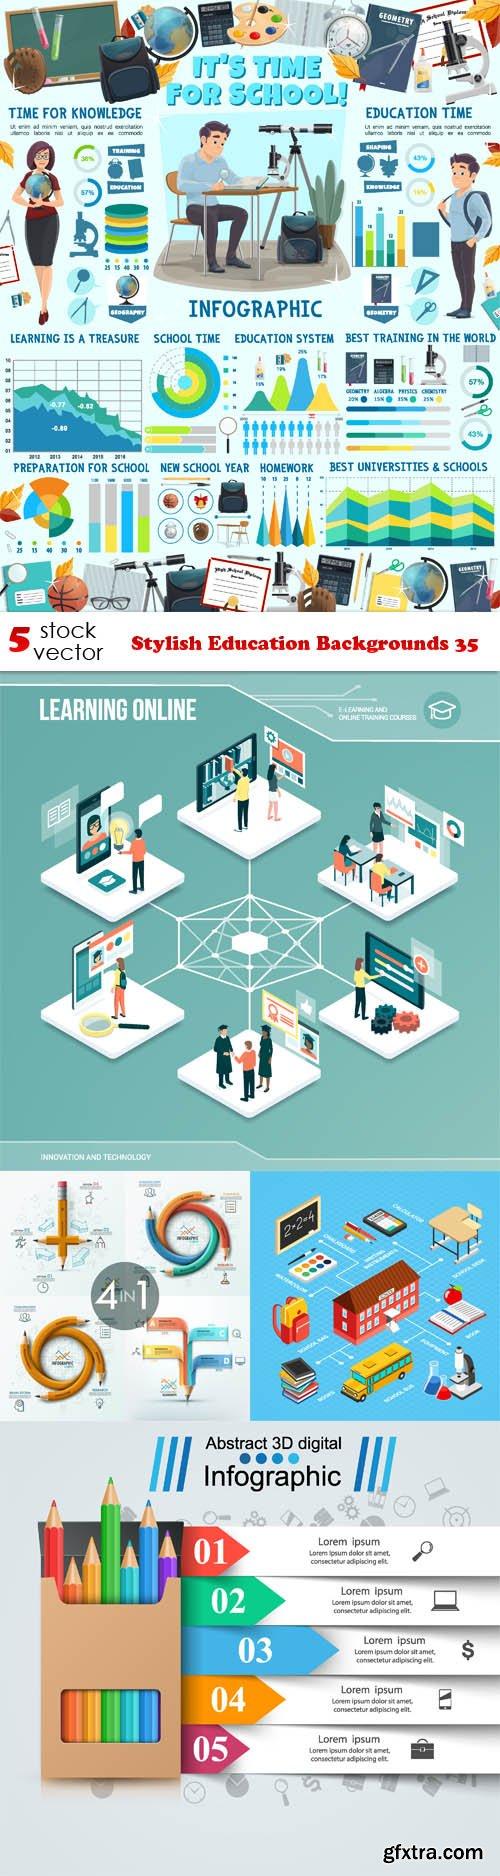 Vectors - Stylish Education Backgrounds 35